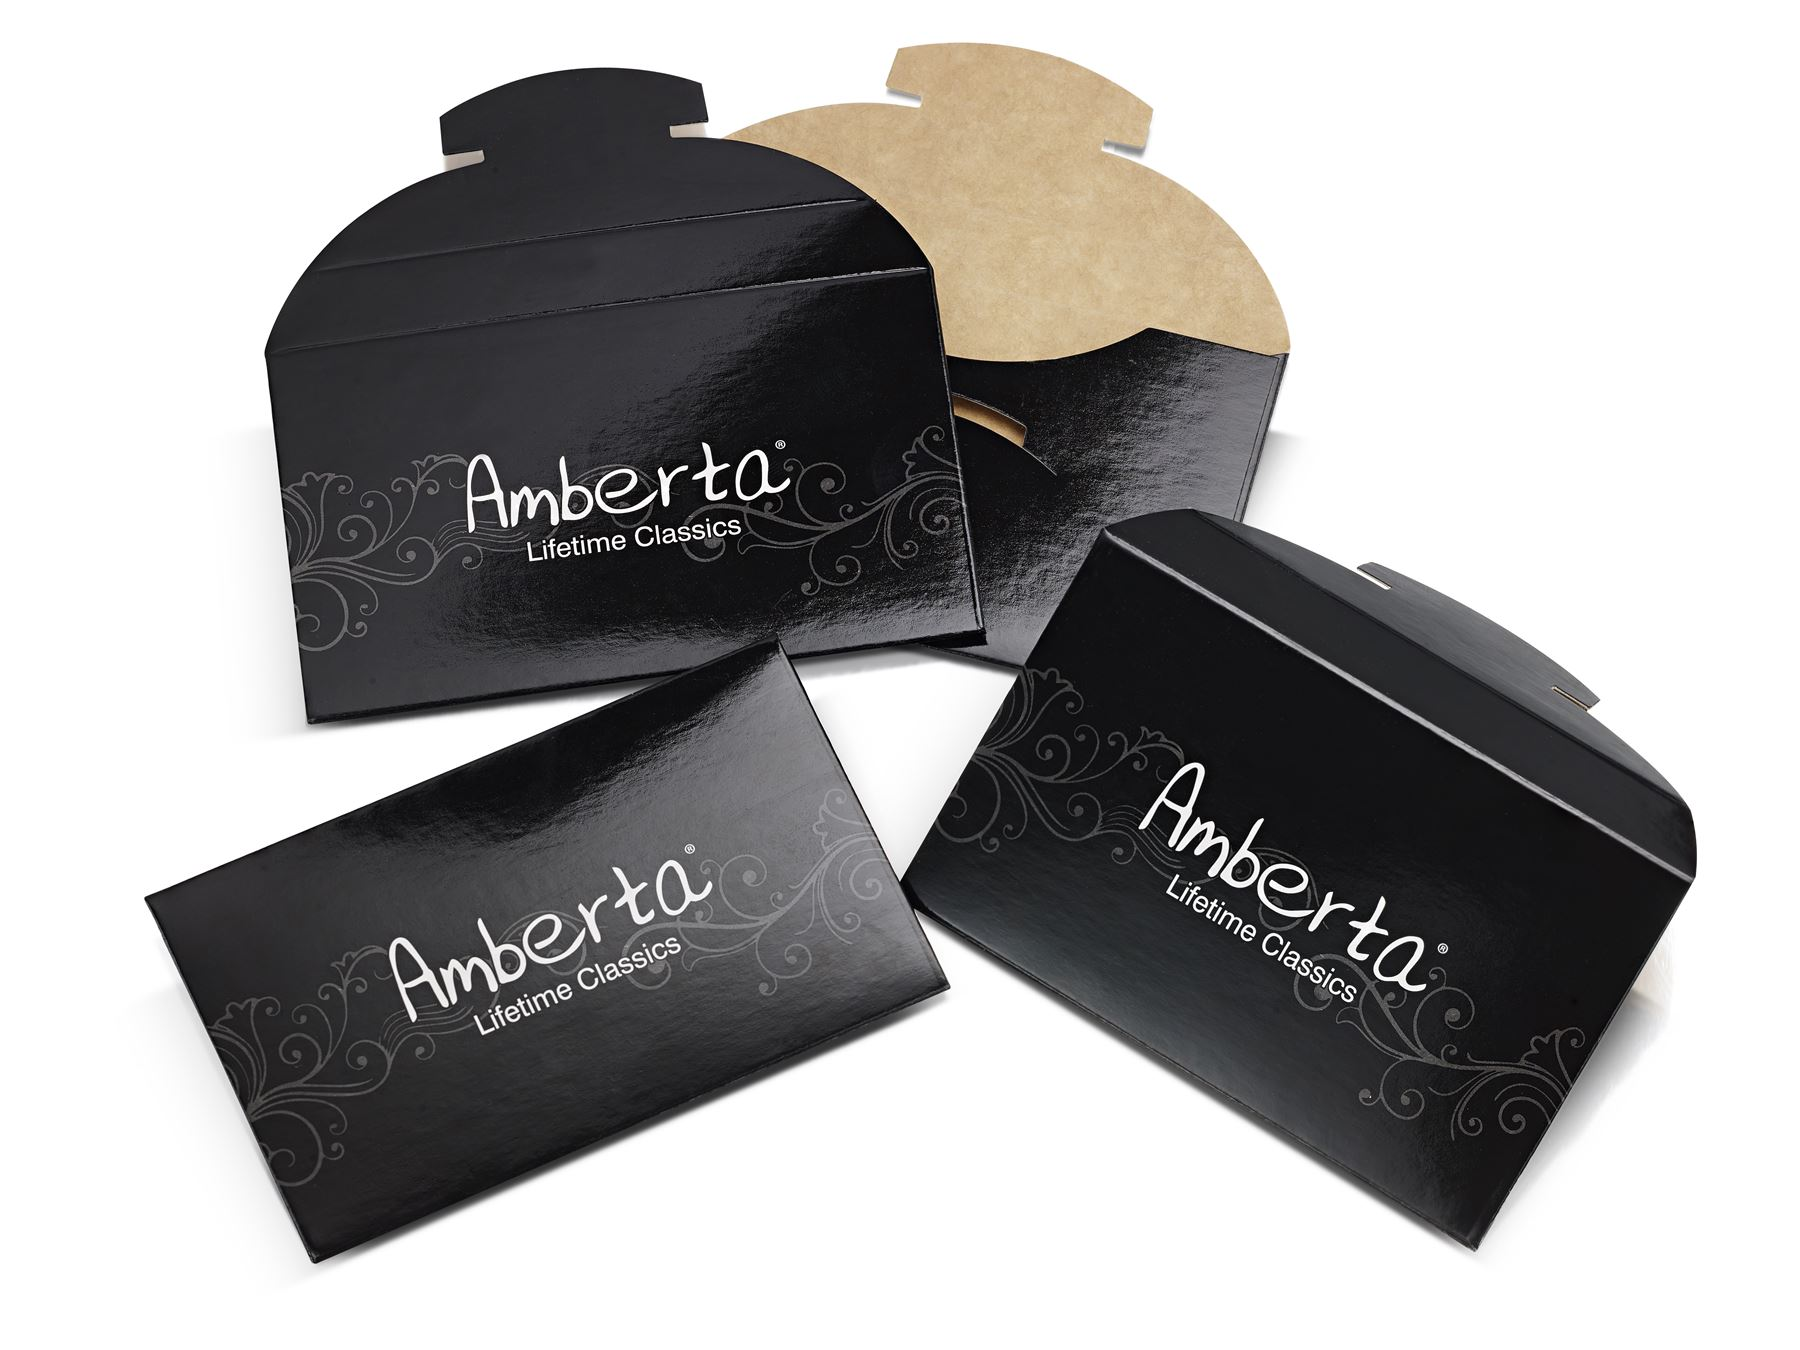 Amberta-Jewelry-925-Sterling-Silver-Adjustable-Bracelet-Italian-Bangle-for-Women thumbnail 64